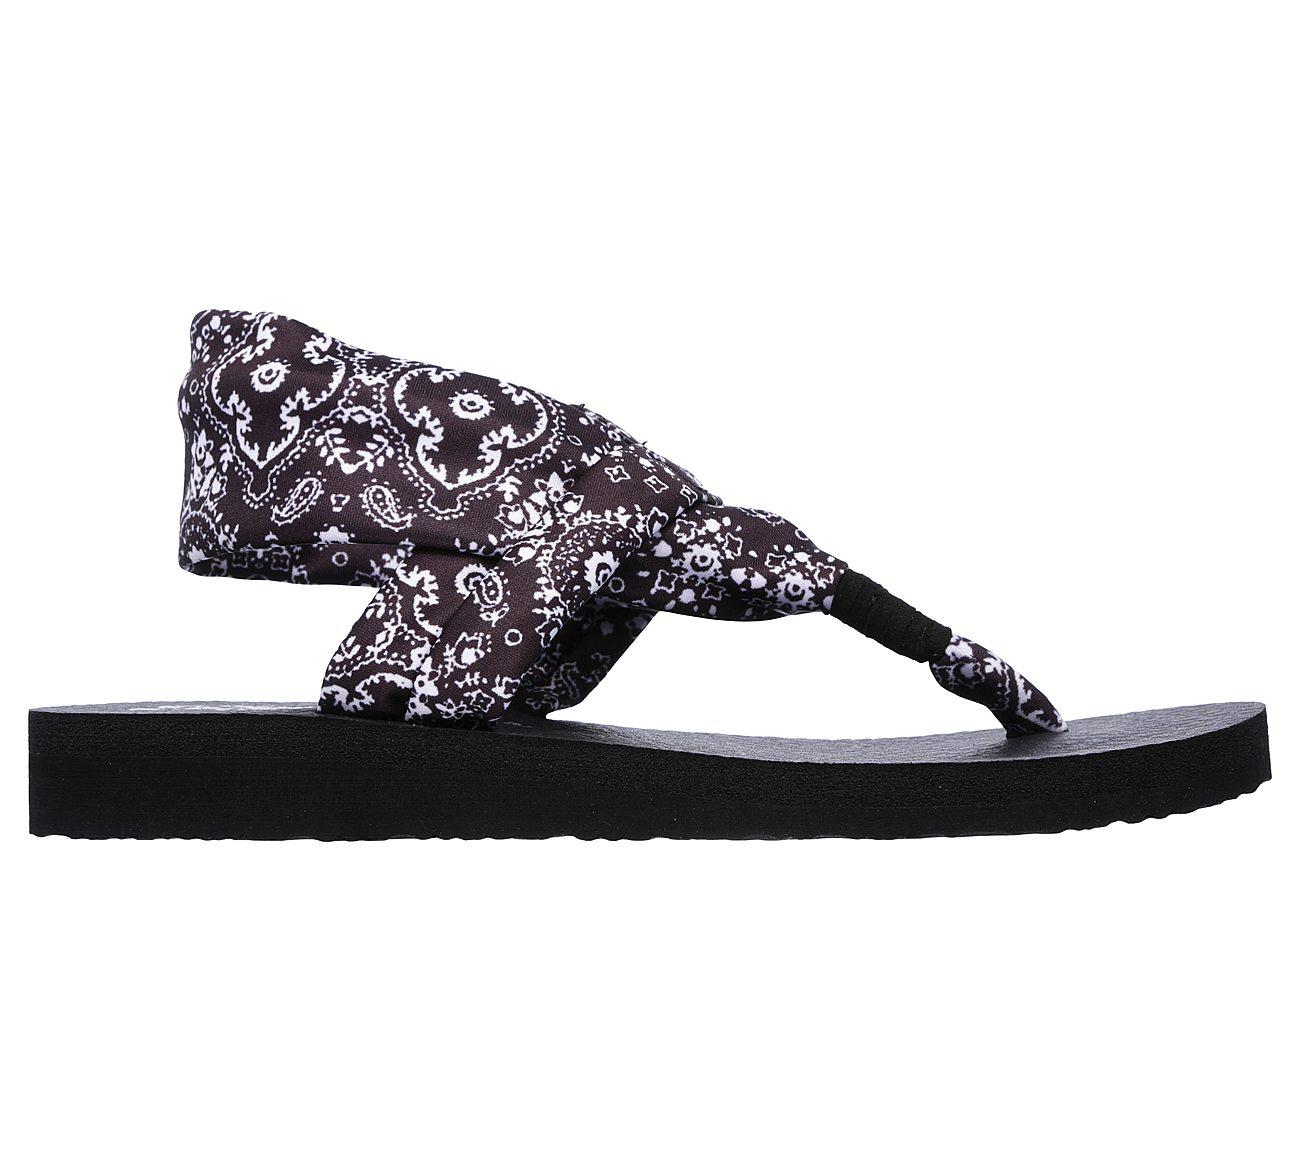 cb708881e2b9 Buy SKECHERS Cali  Meditation - Studio Kicks Cali Shoes only  38.00